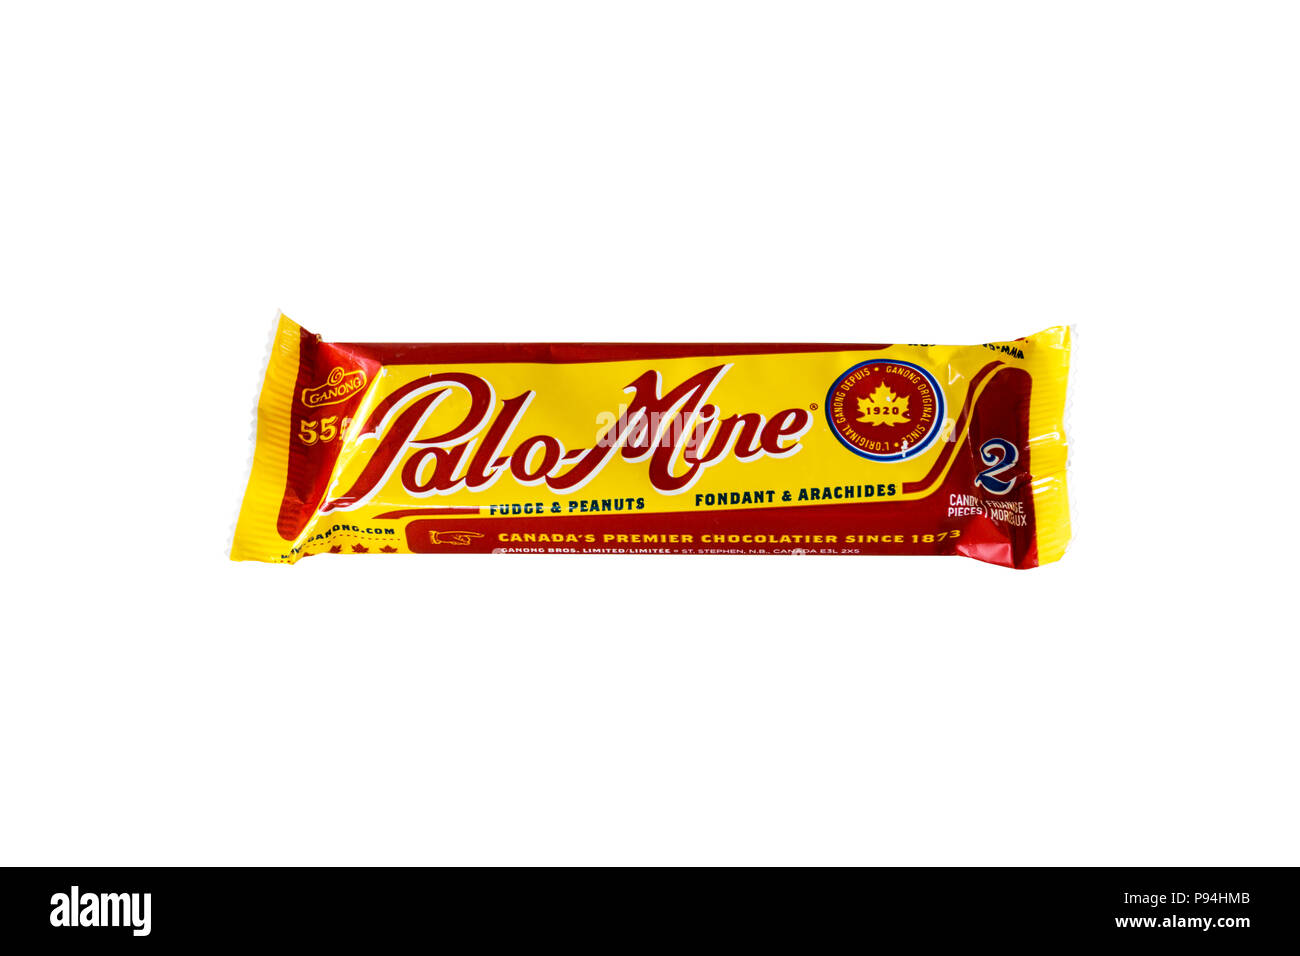 Pal-o-Mine fudge and peanut bar made by Ganong of Canada - Stock Image